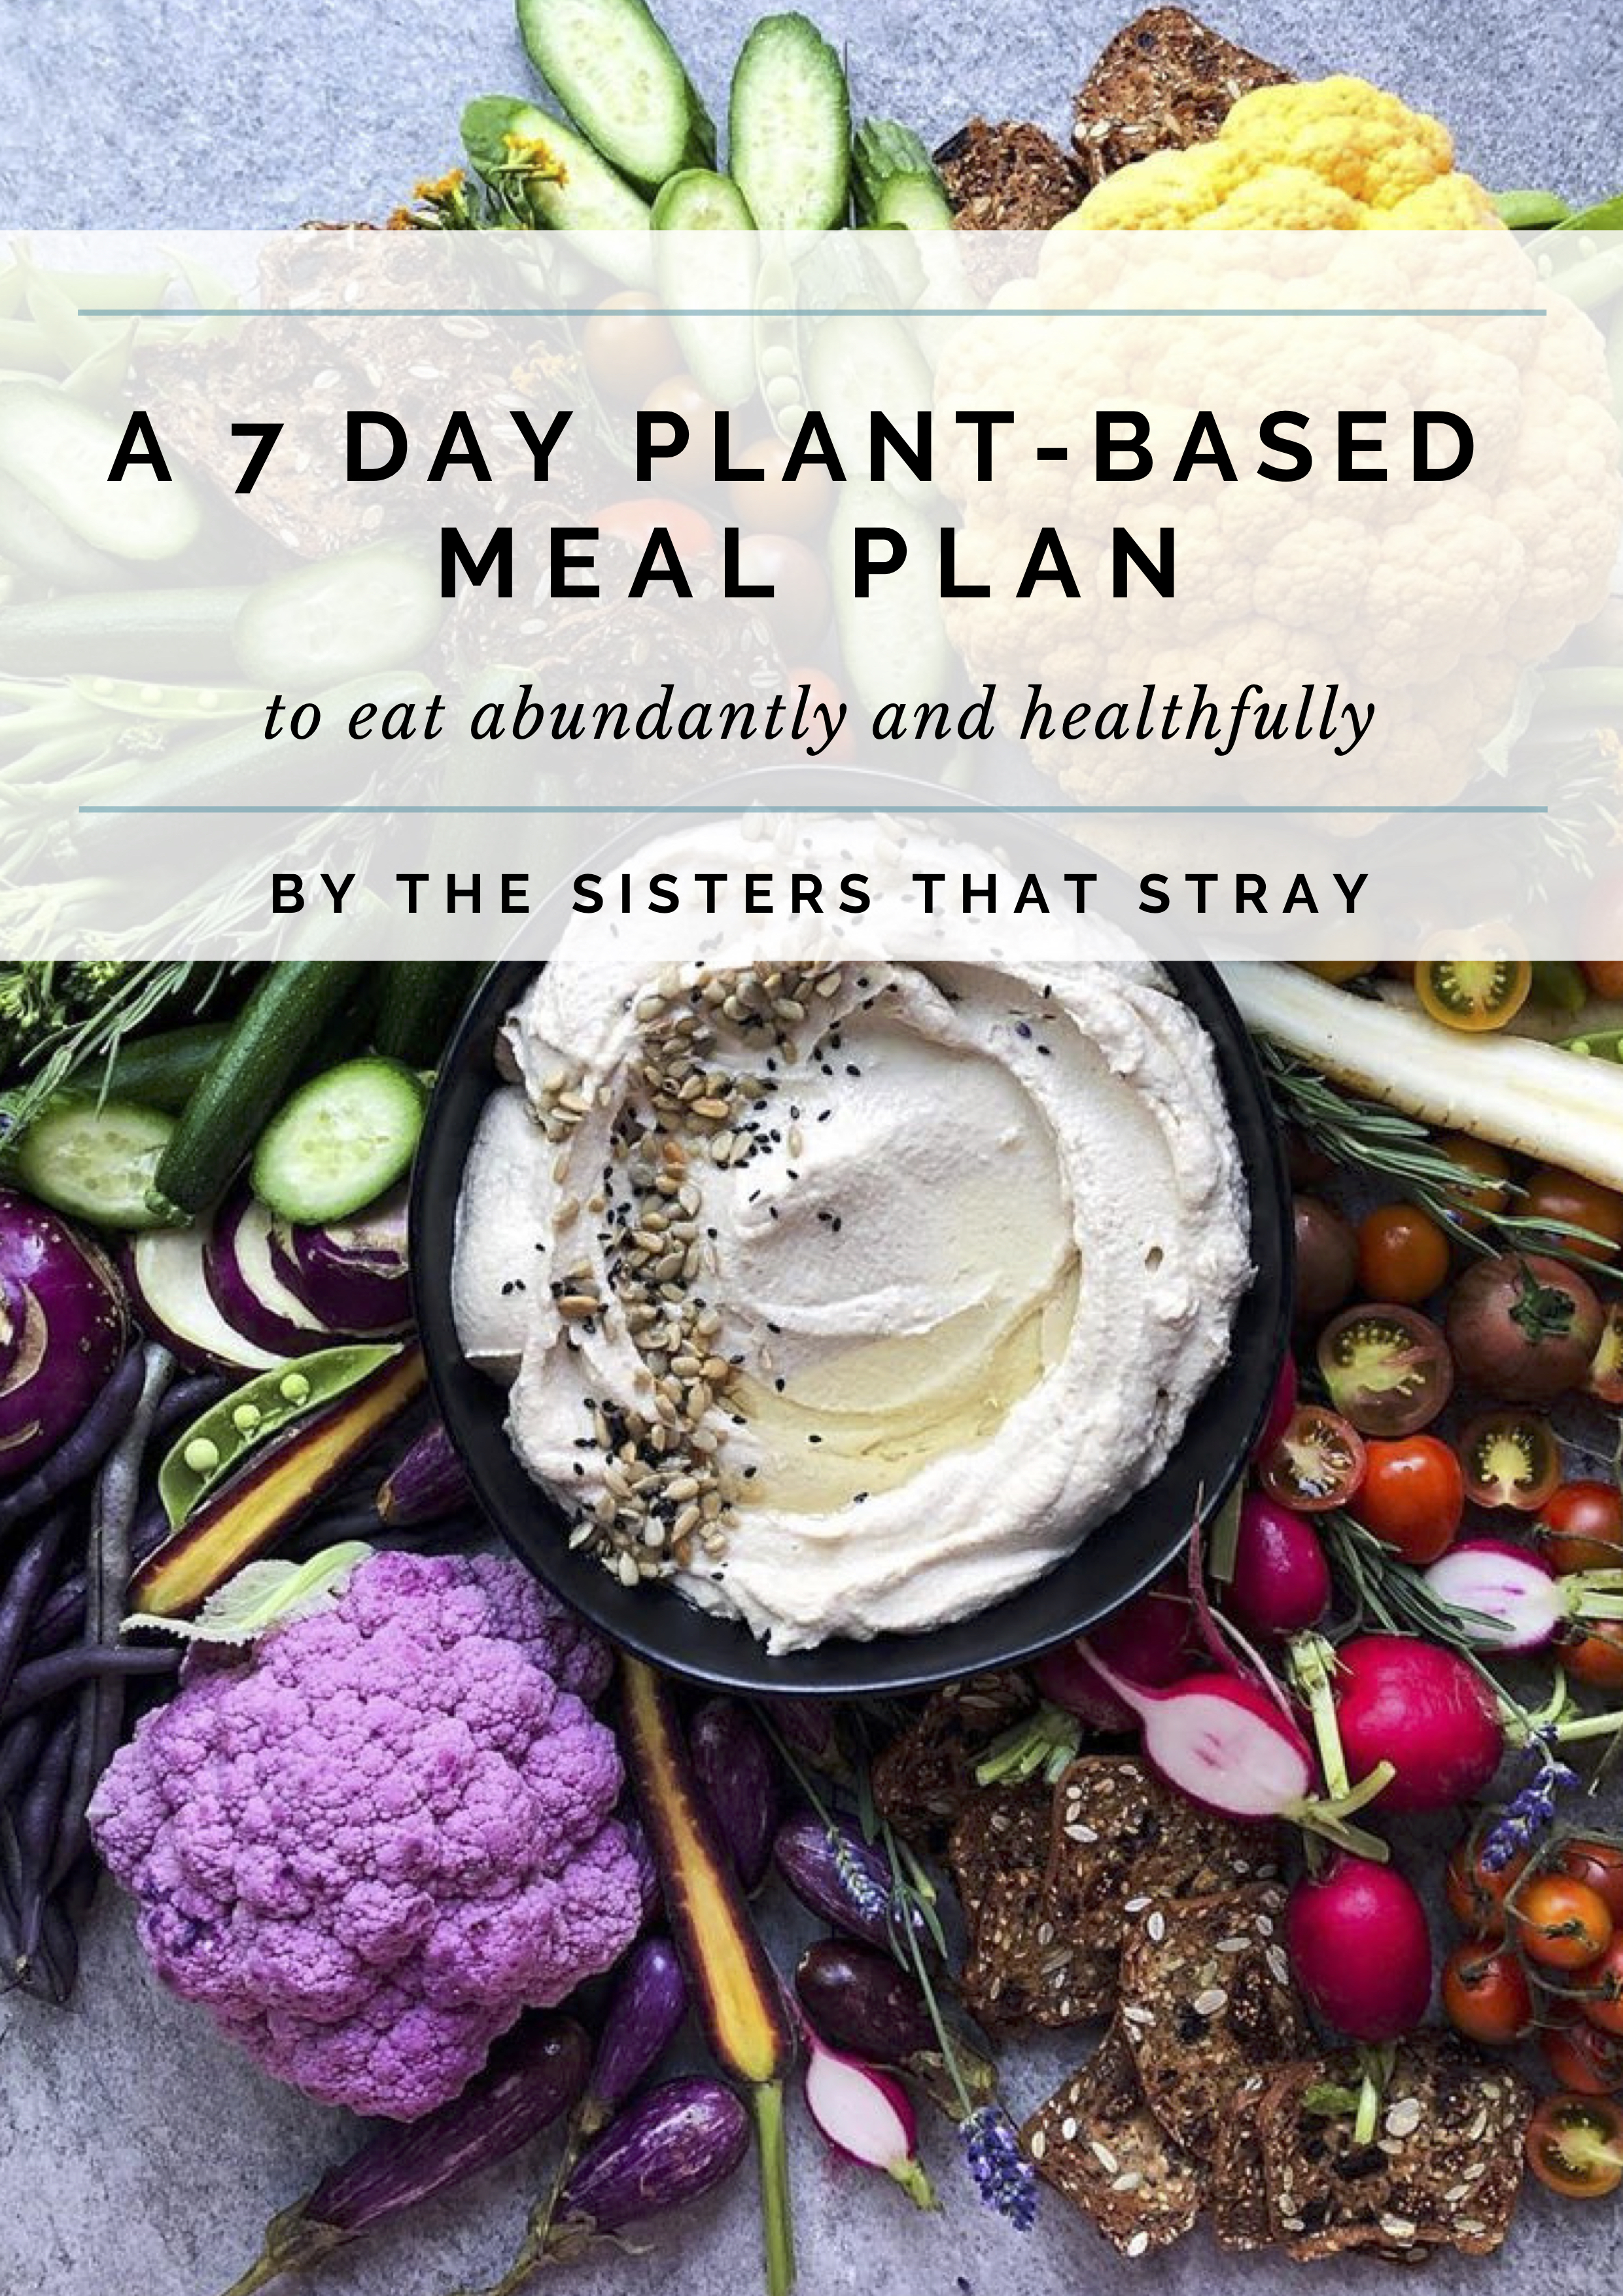 7 day vegan meal plan cover.jpg